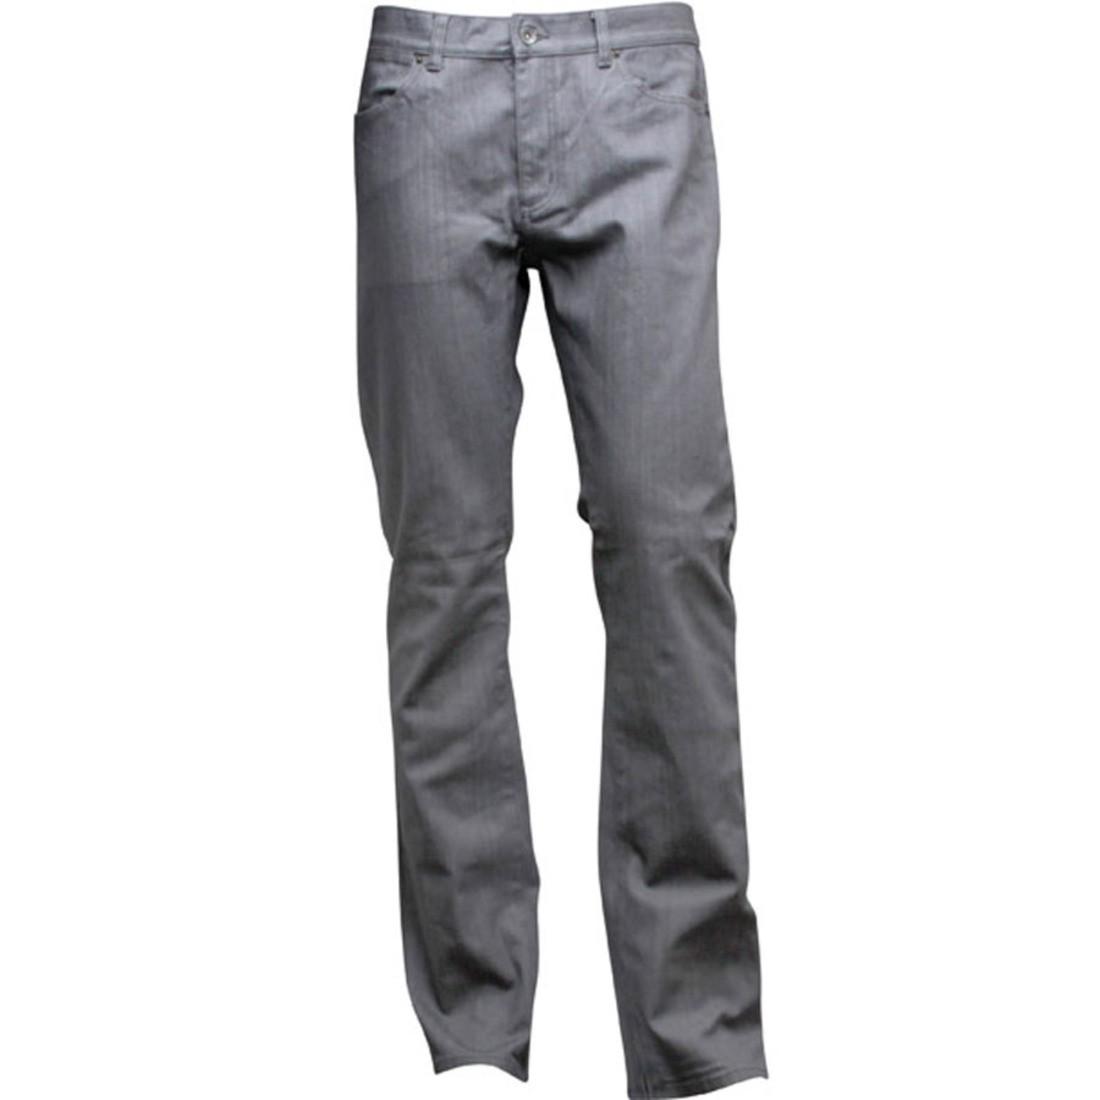 GRAY灰色 グレイ 【 GREY KR3W KSLIM LINED JEAN 】 メンズファッション ズボン パンツ